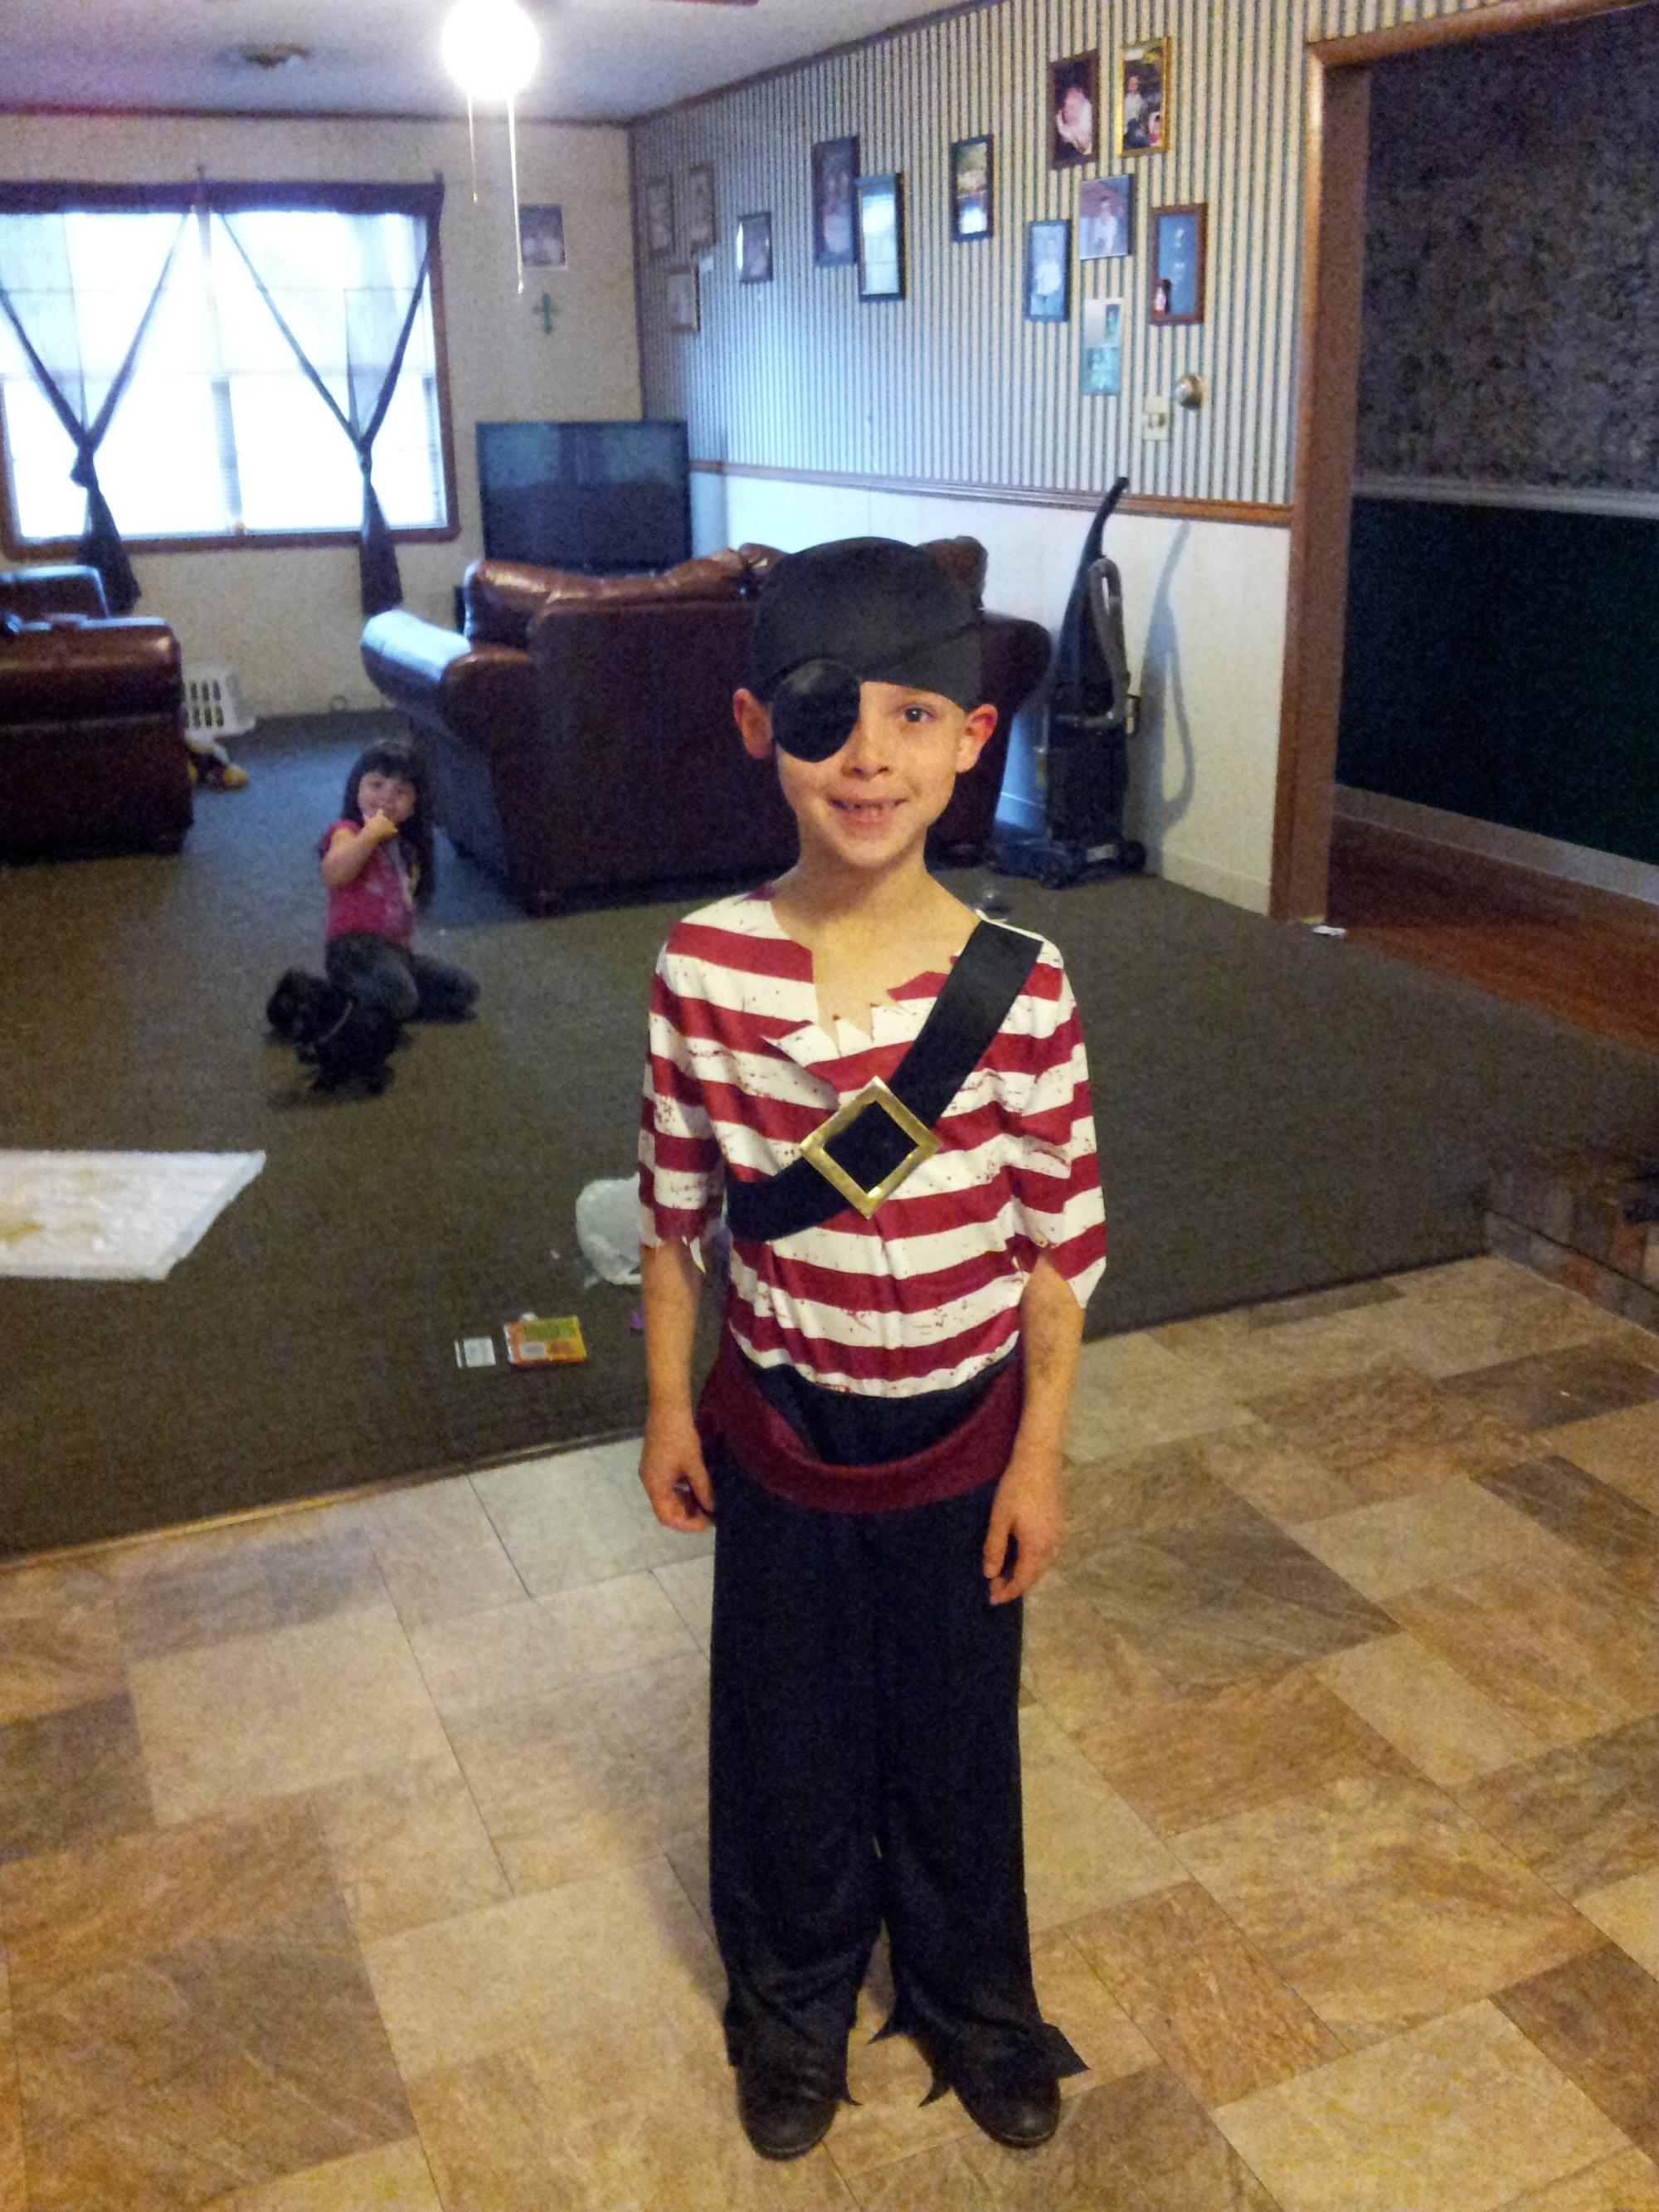 Antonio the Pirate